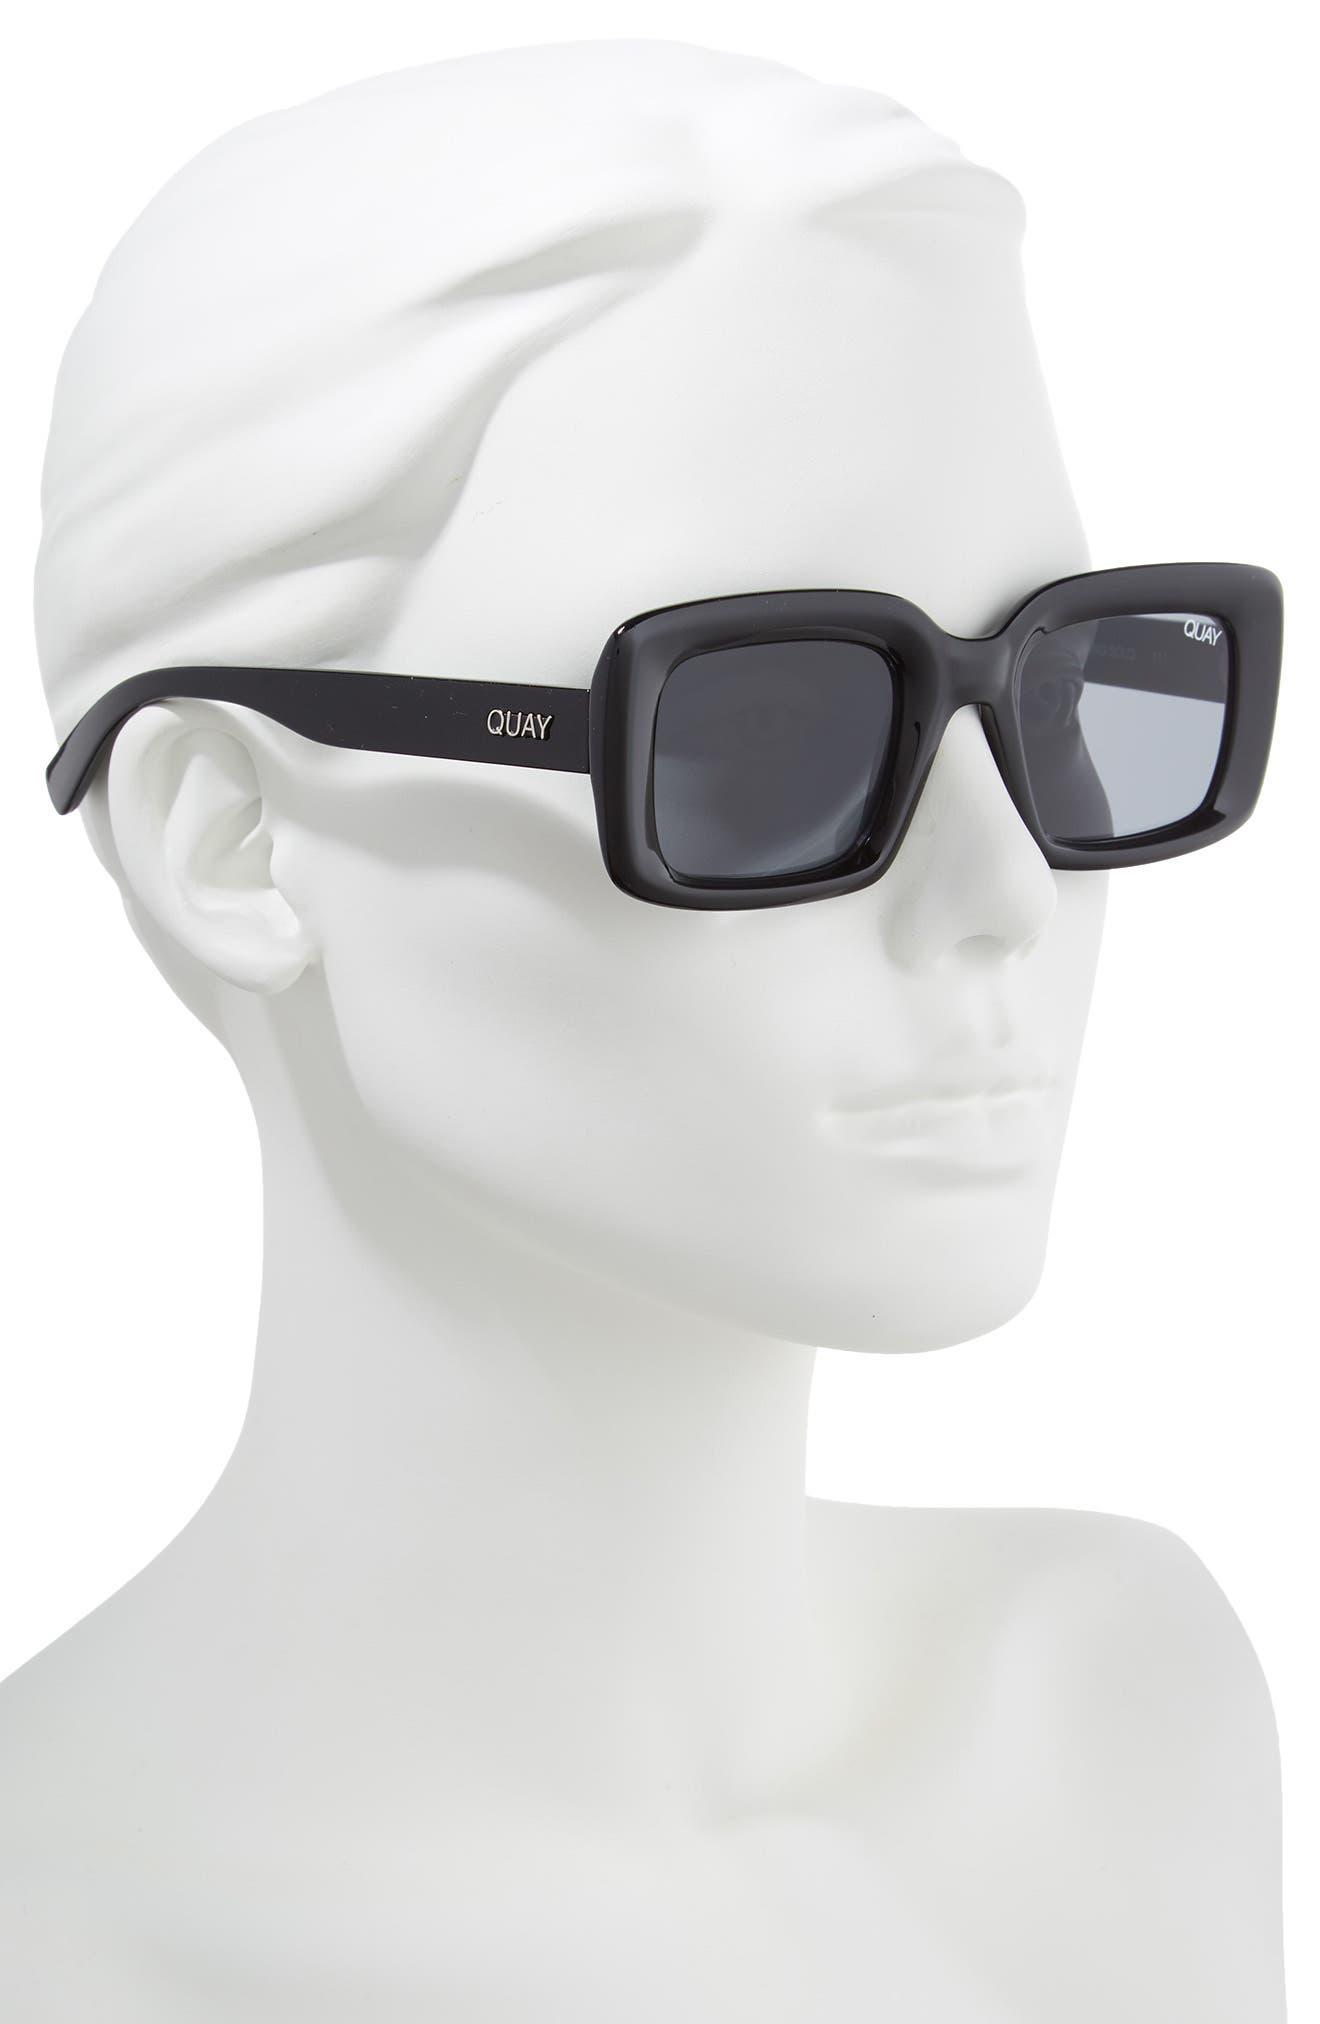 Going Solo 48mm Square Sunglasses,                             Alternate thumbnail 2, color,                             BLACK/ SMOKE